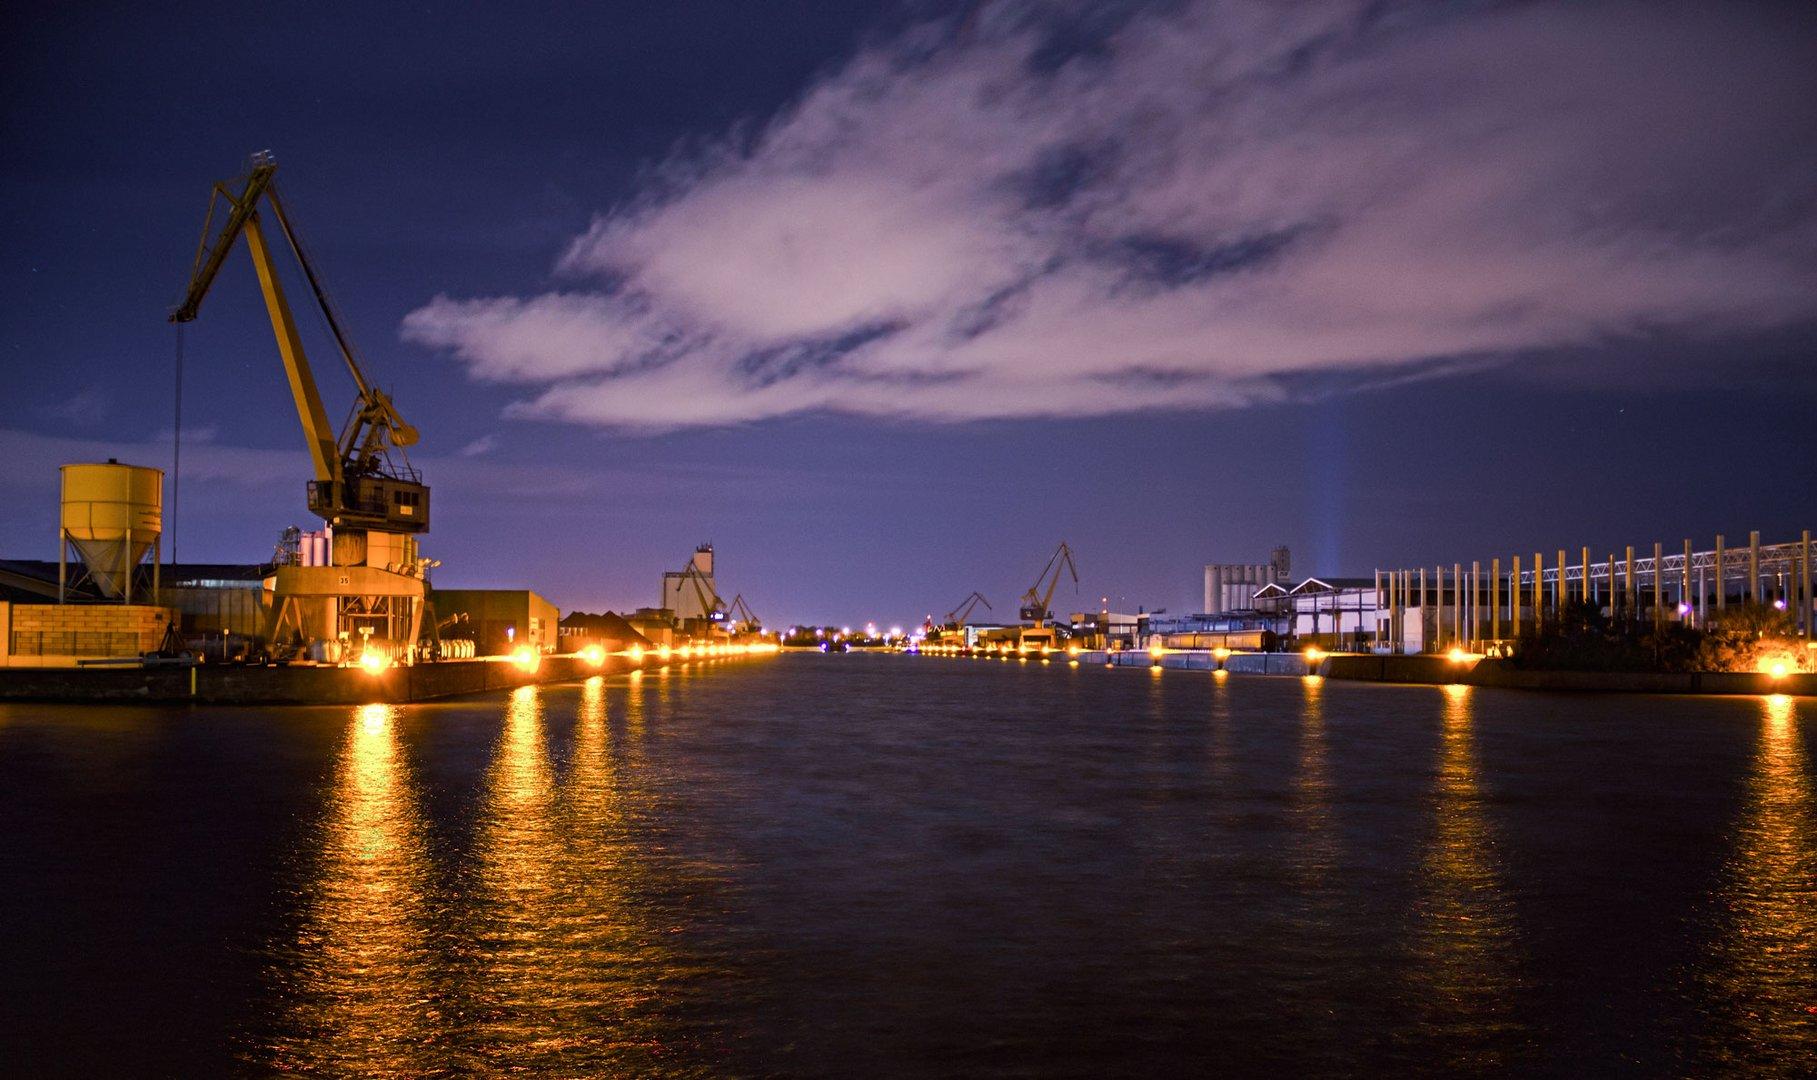 HDR Hafen Eibach